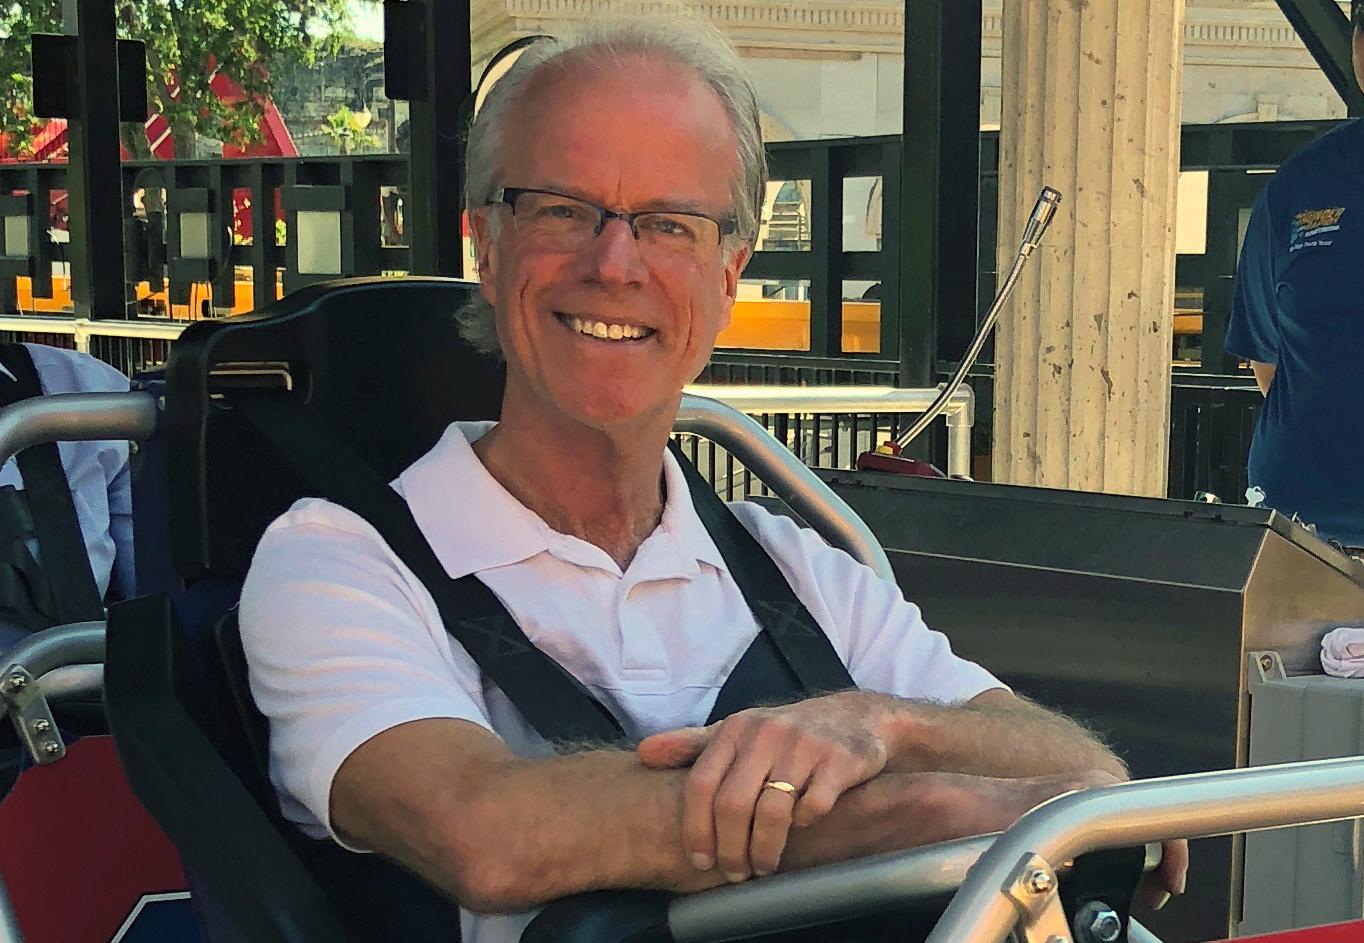 Arthur gets a sneak peek ride on unique single-rail coaster